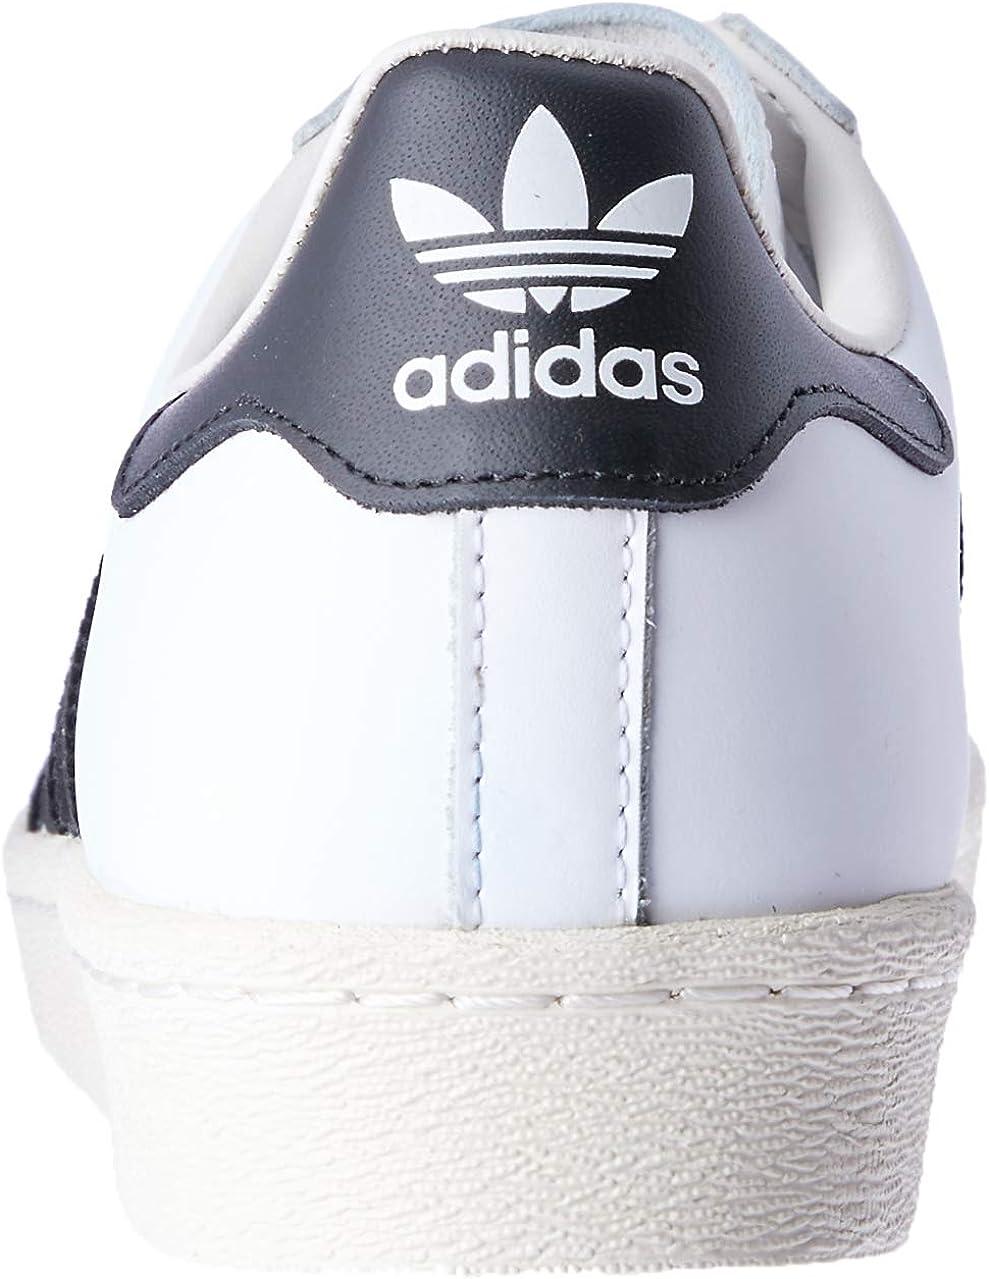 Schuhe Superstar Adidas Pk 80er Regenbogen Weiß Der